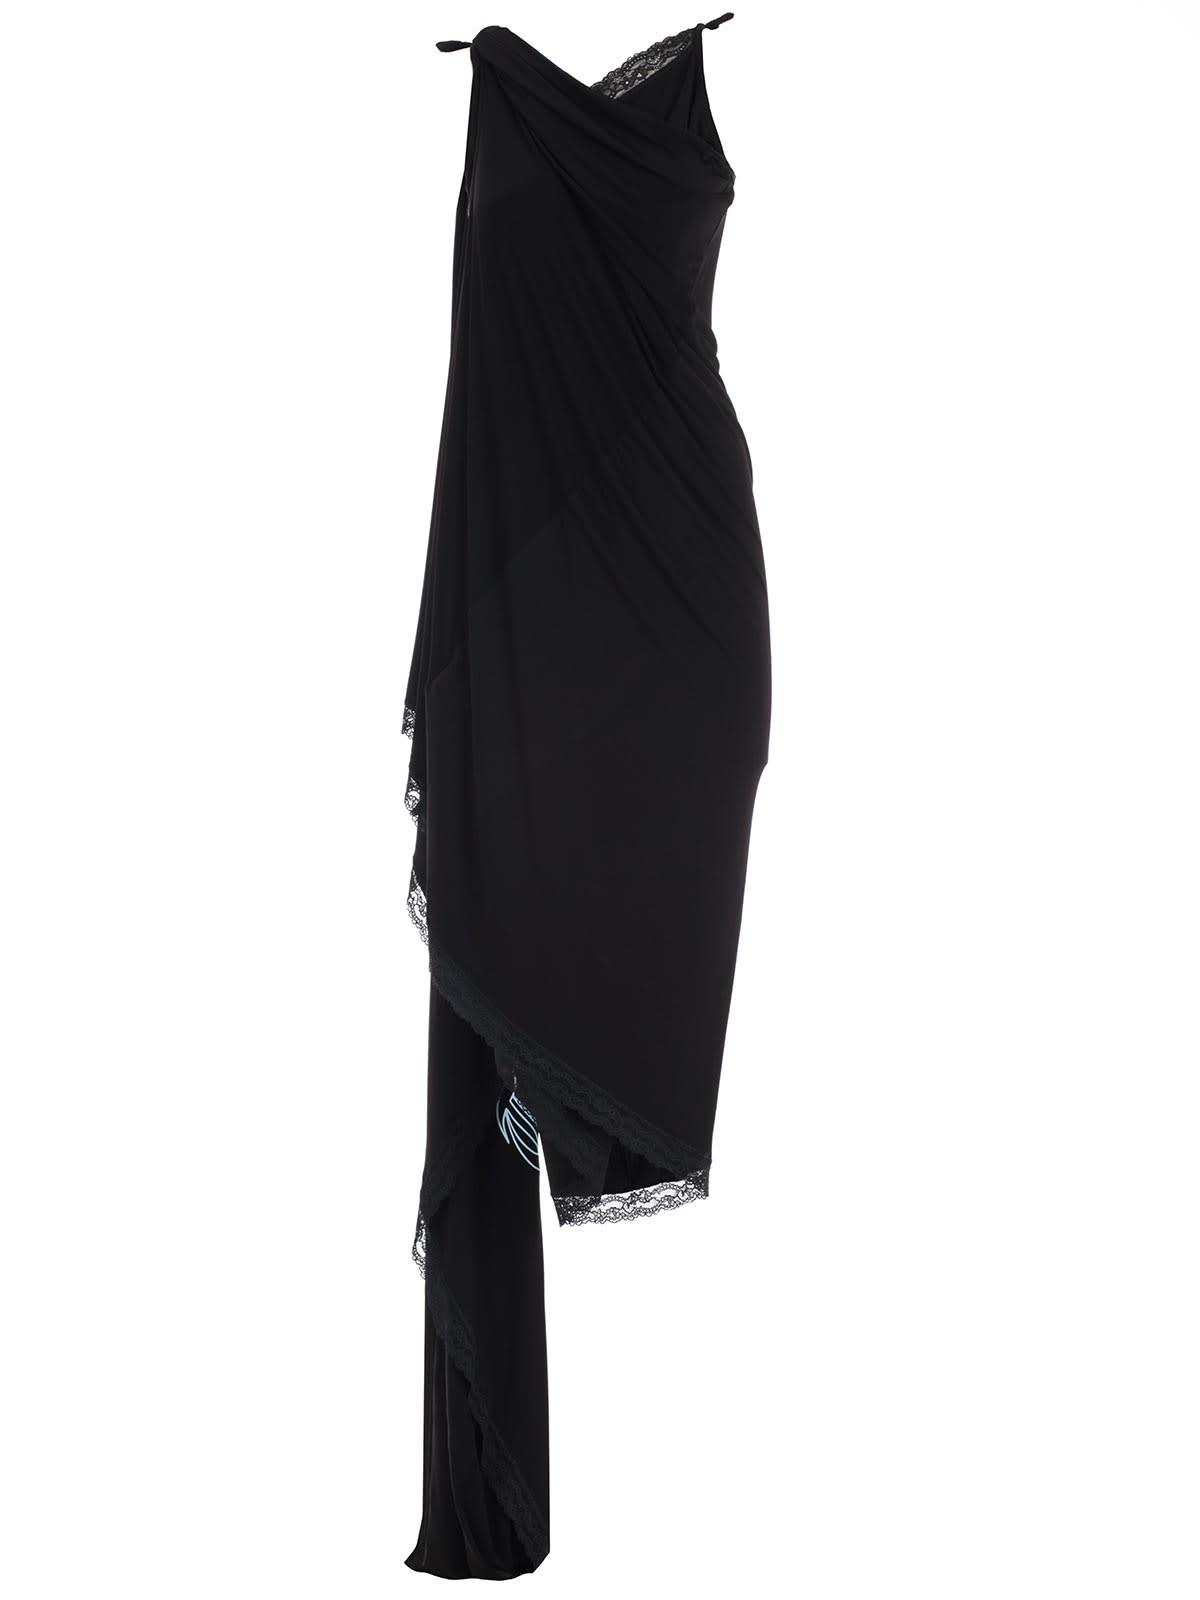 VETEMENTS Pirate Lingerie Dress